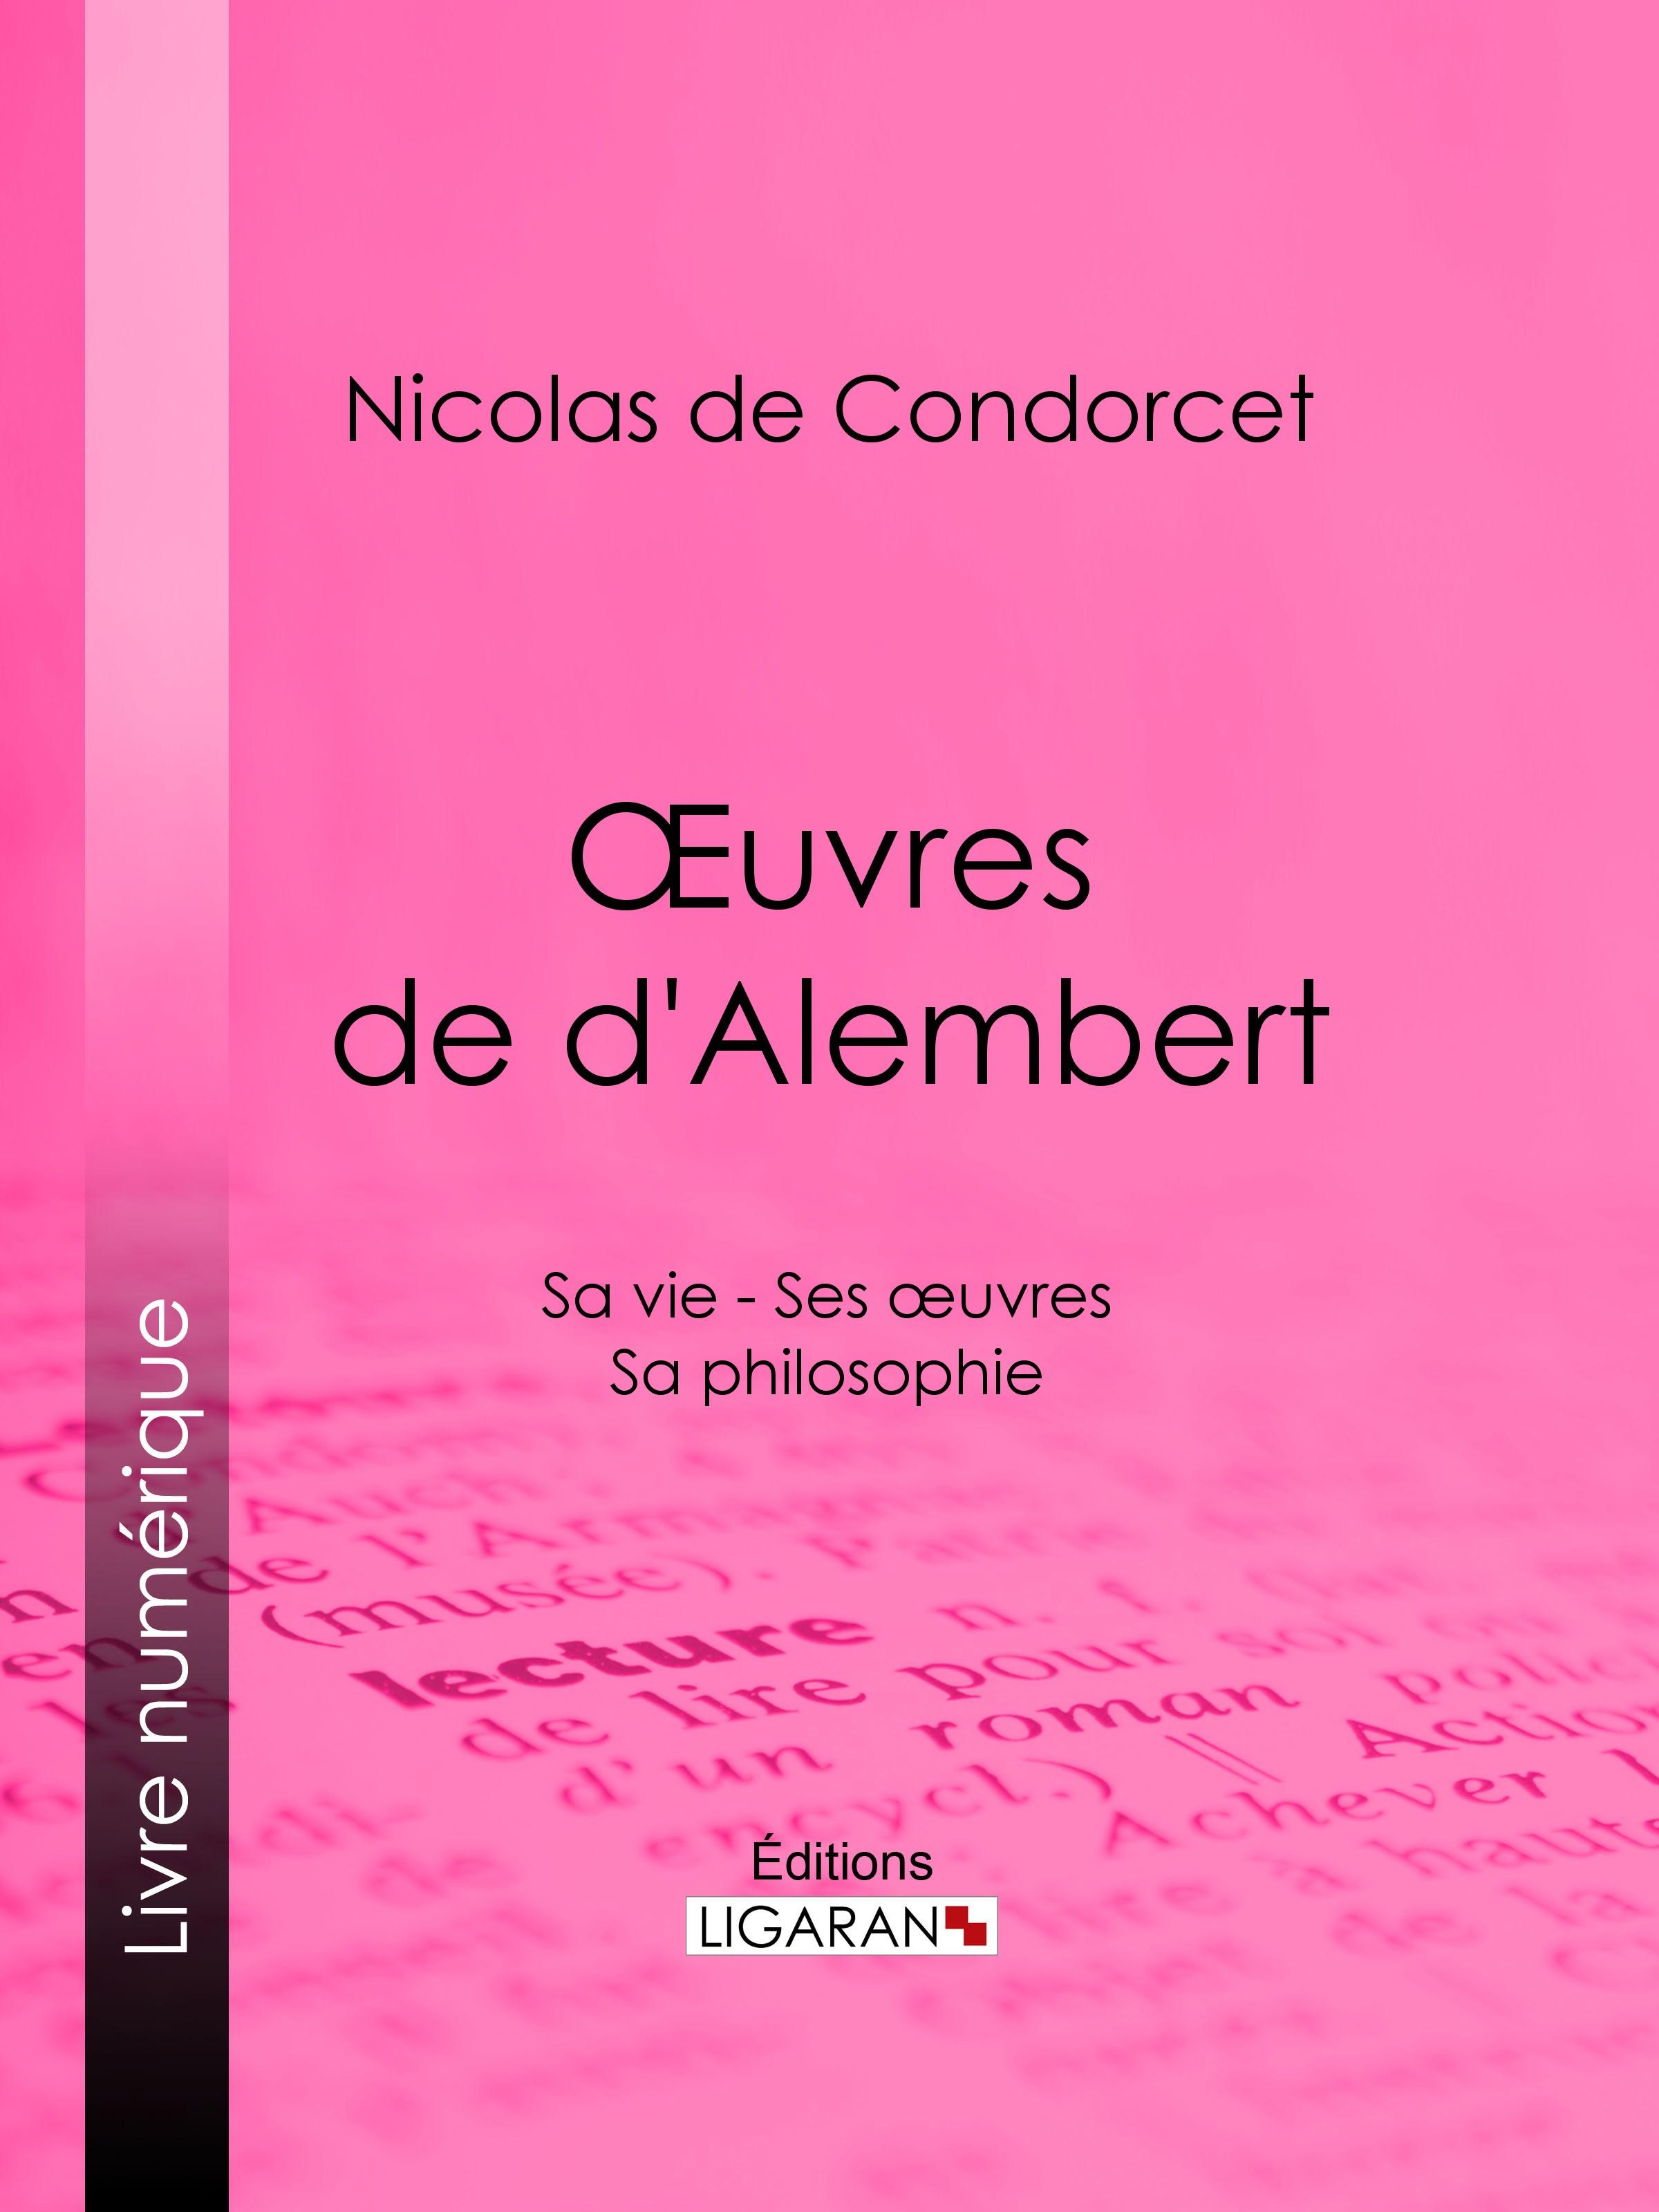 Œuvres de d'Alembert